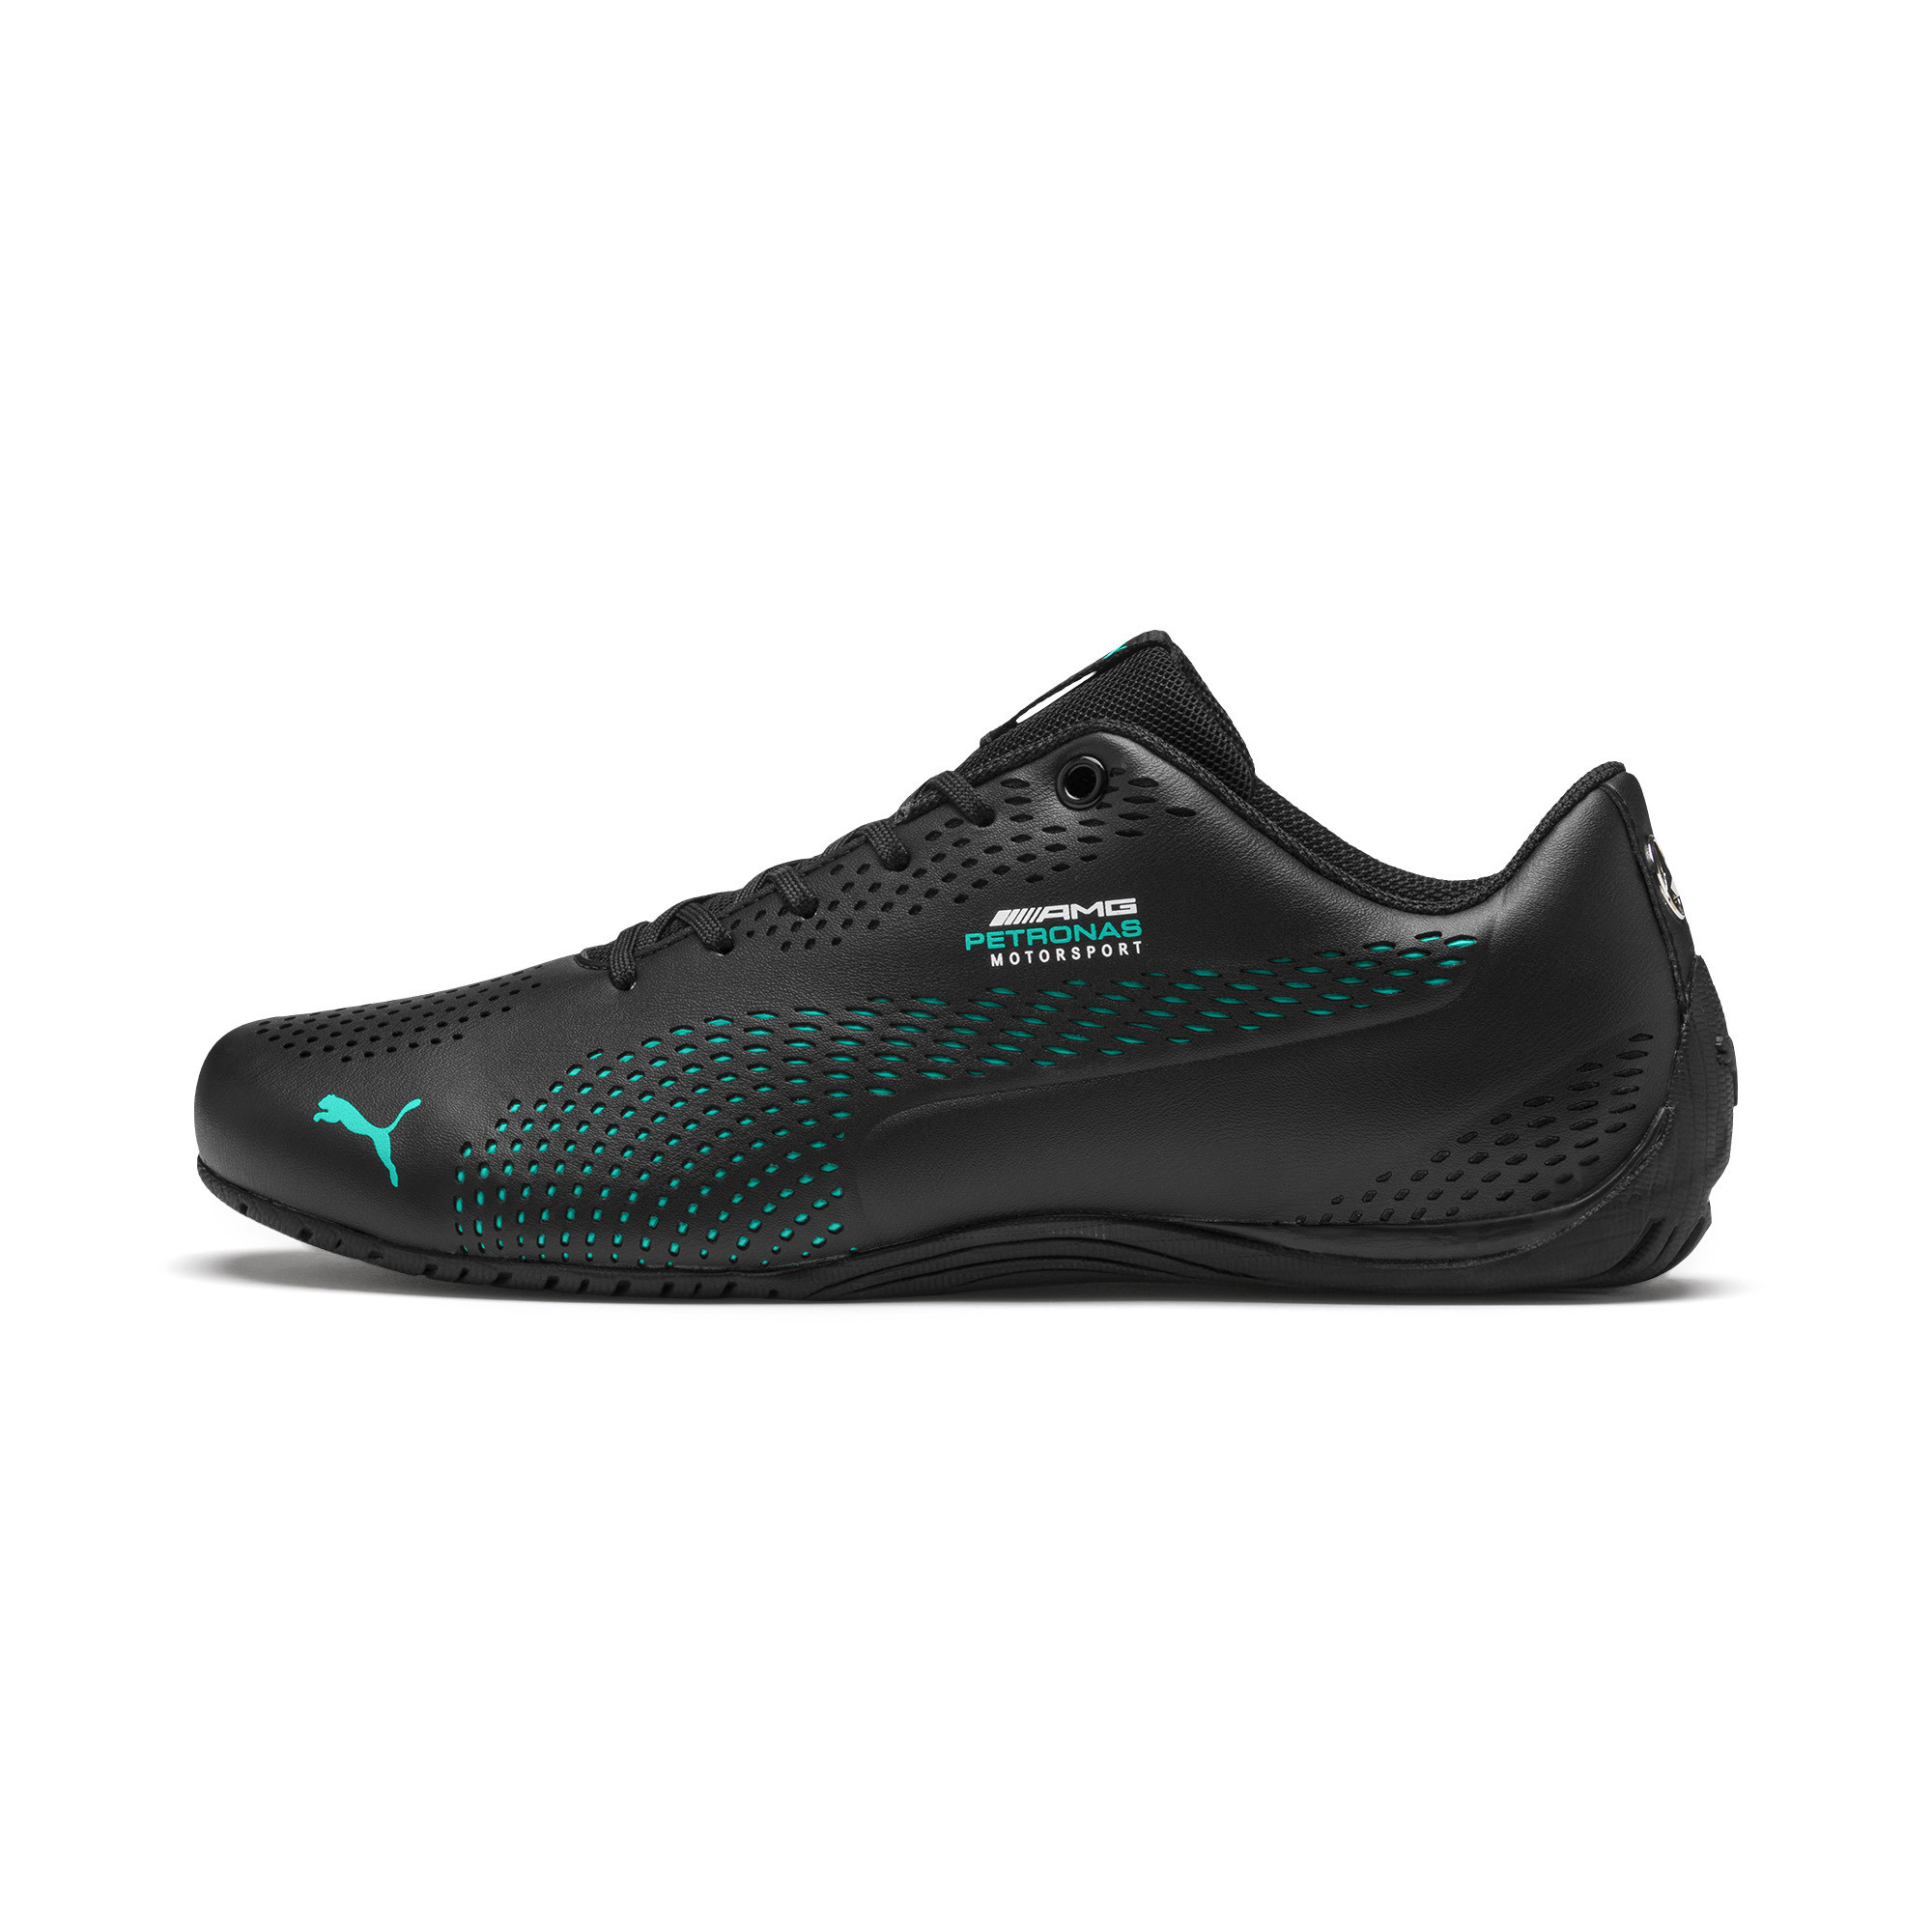 PUMA-Mercedes-AMG-Petronas-Drift-Cat-5-Ultra-II-Sneaker-Unisex-Schuhe-Neu Indexbild 14